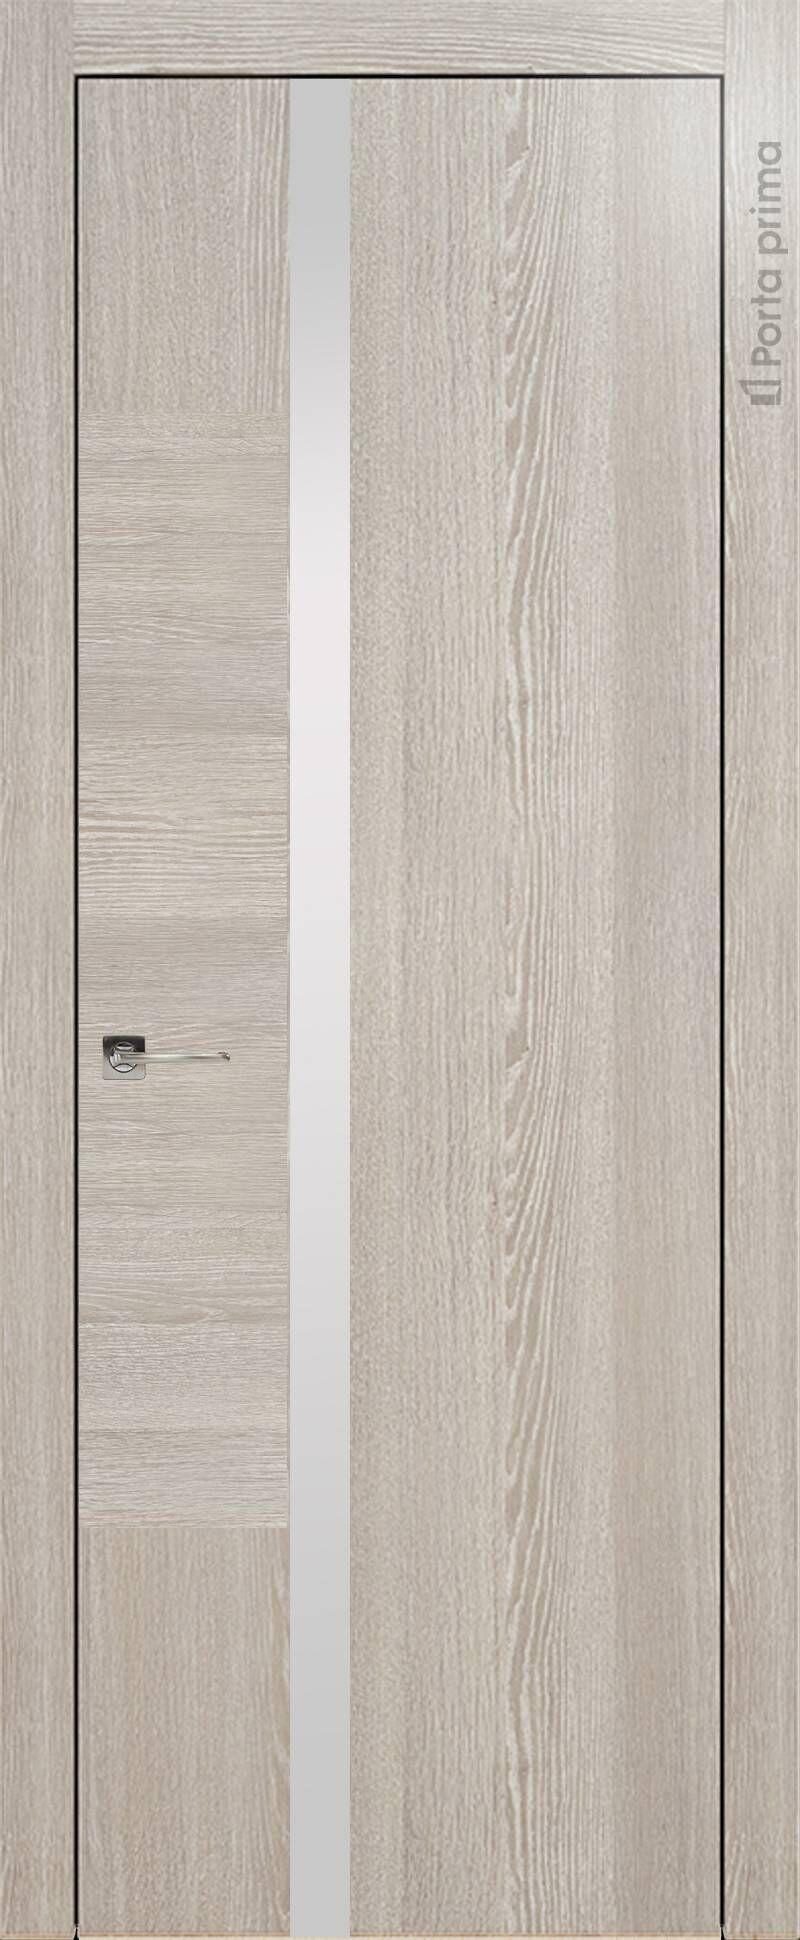 Tivoli Д-1 цвет - Серый дуб Без стекла (ДГ)